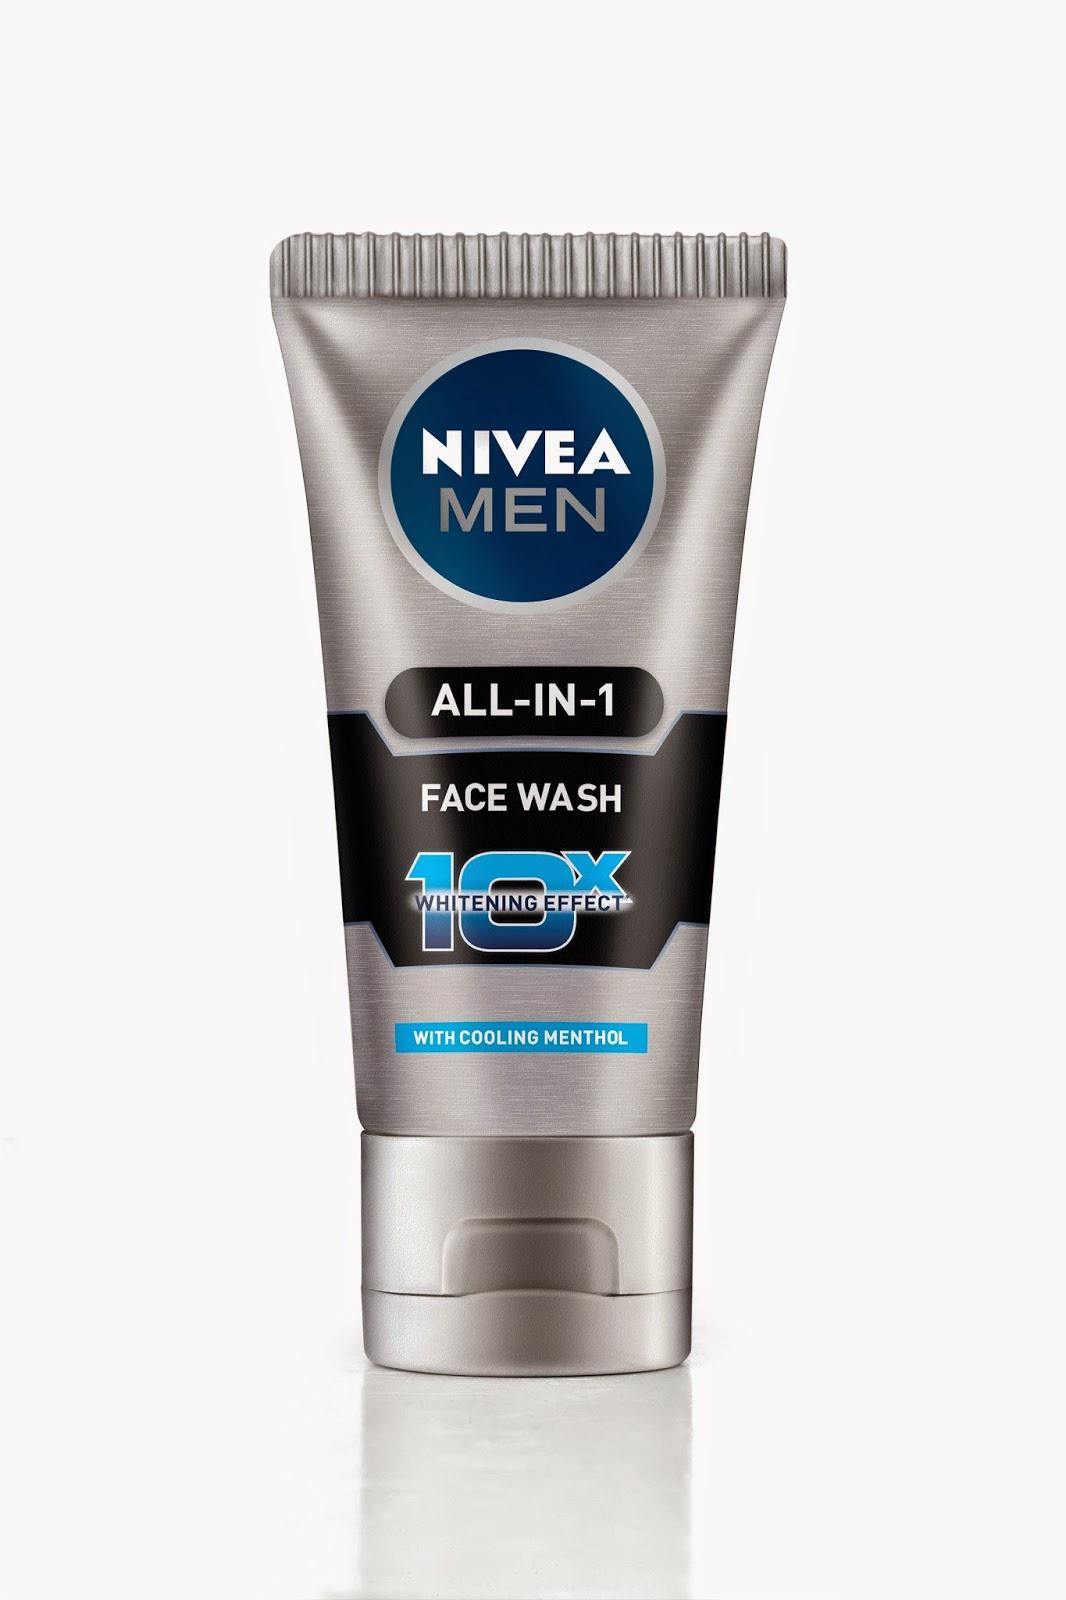 PR:New Nivea Men All-in-1 Face wash